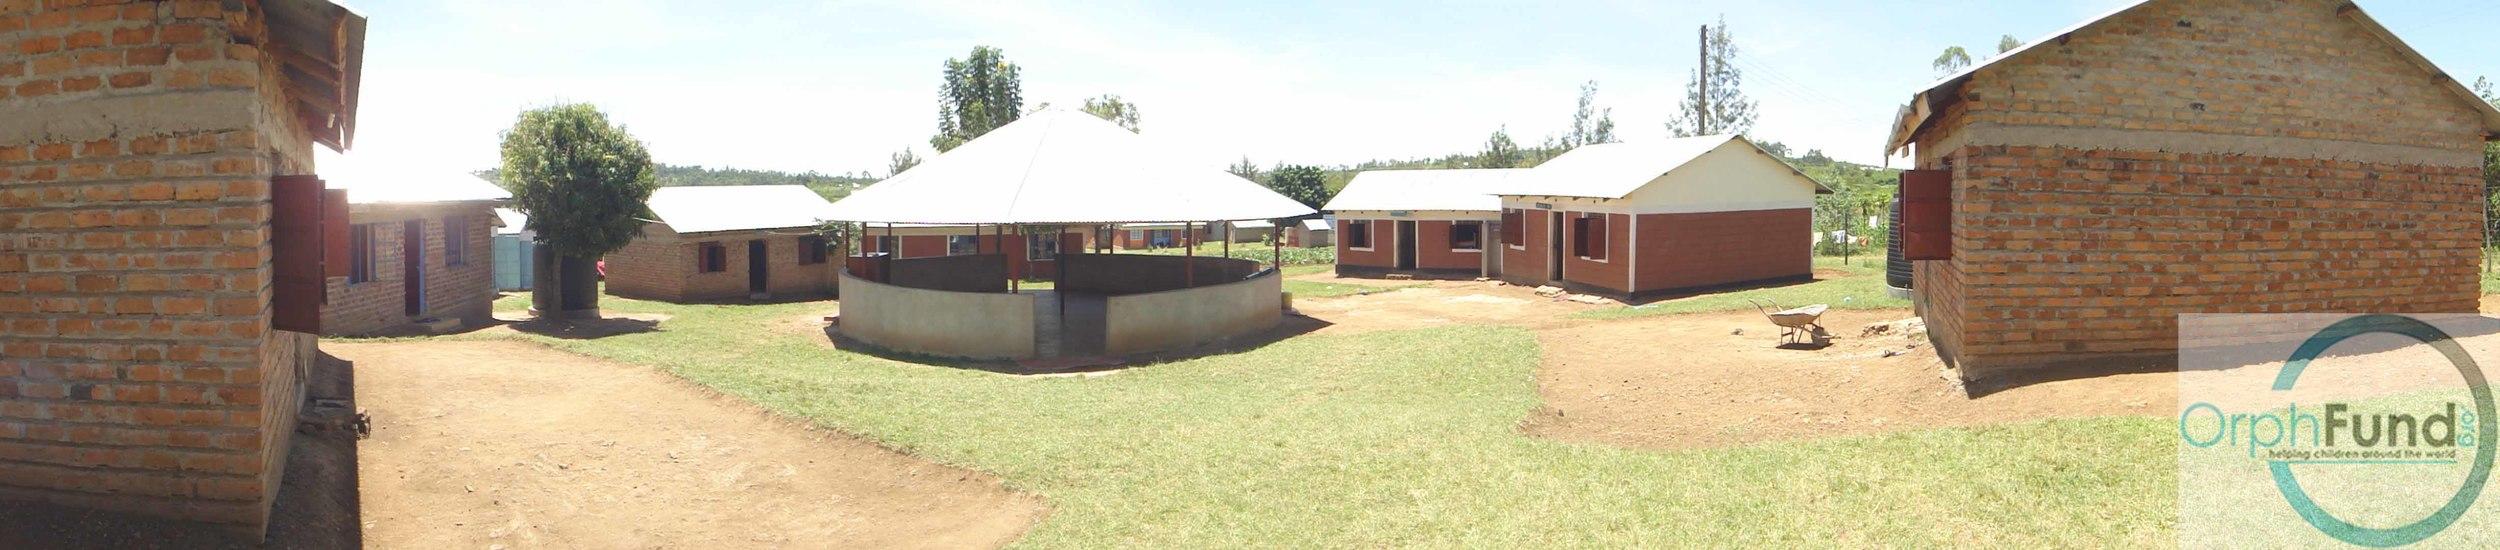 kenya childrens village copy.jpg